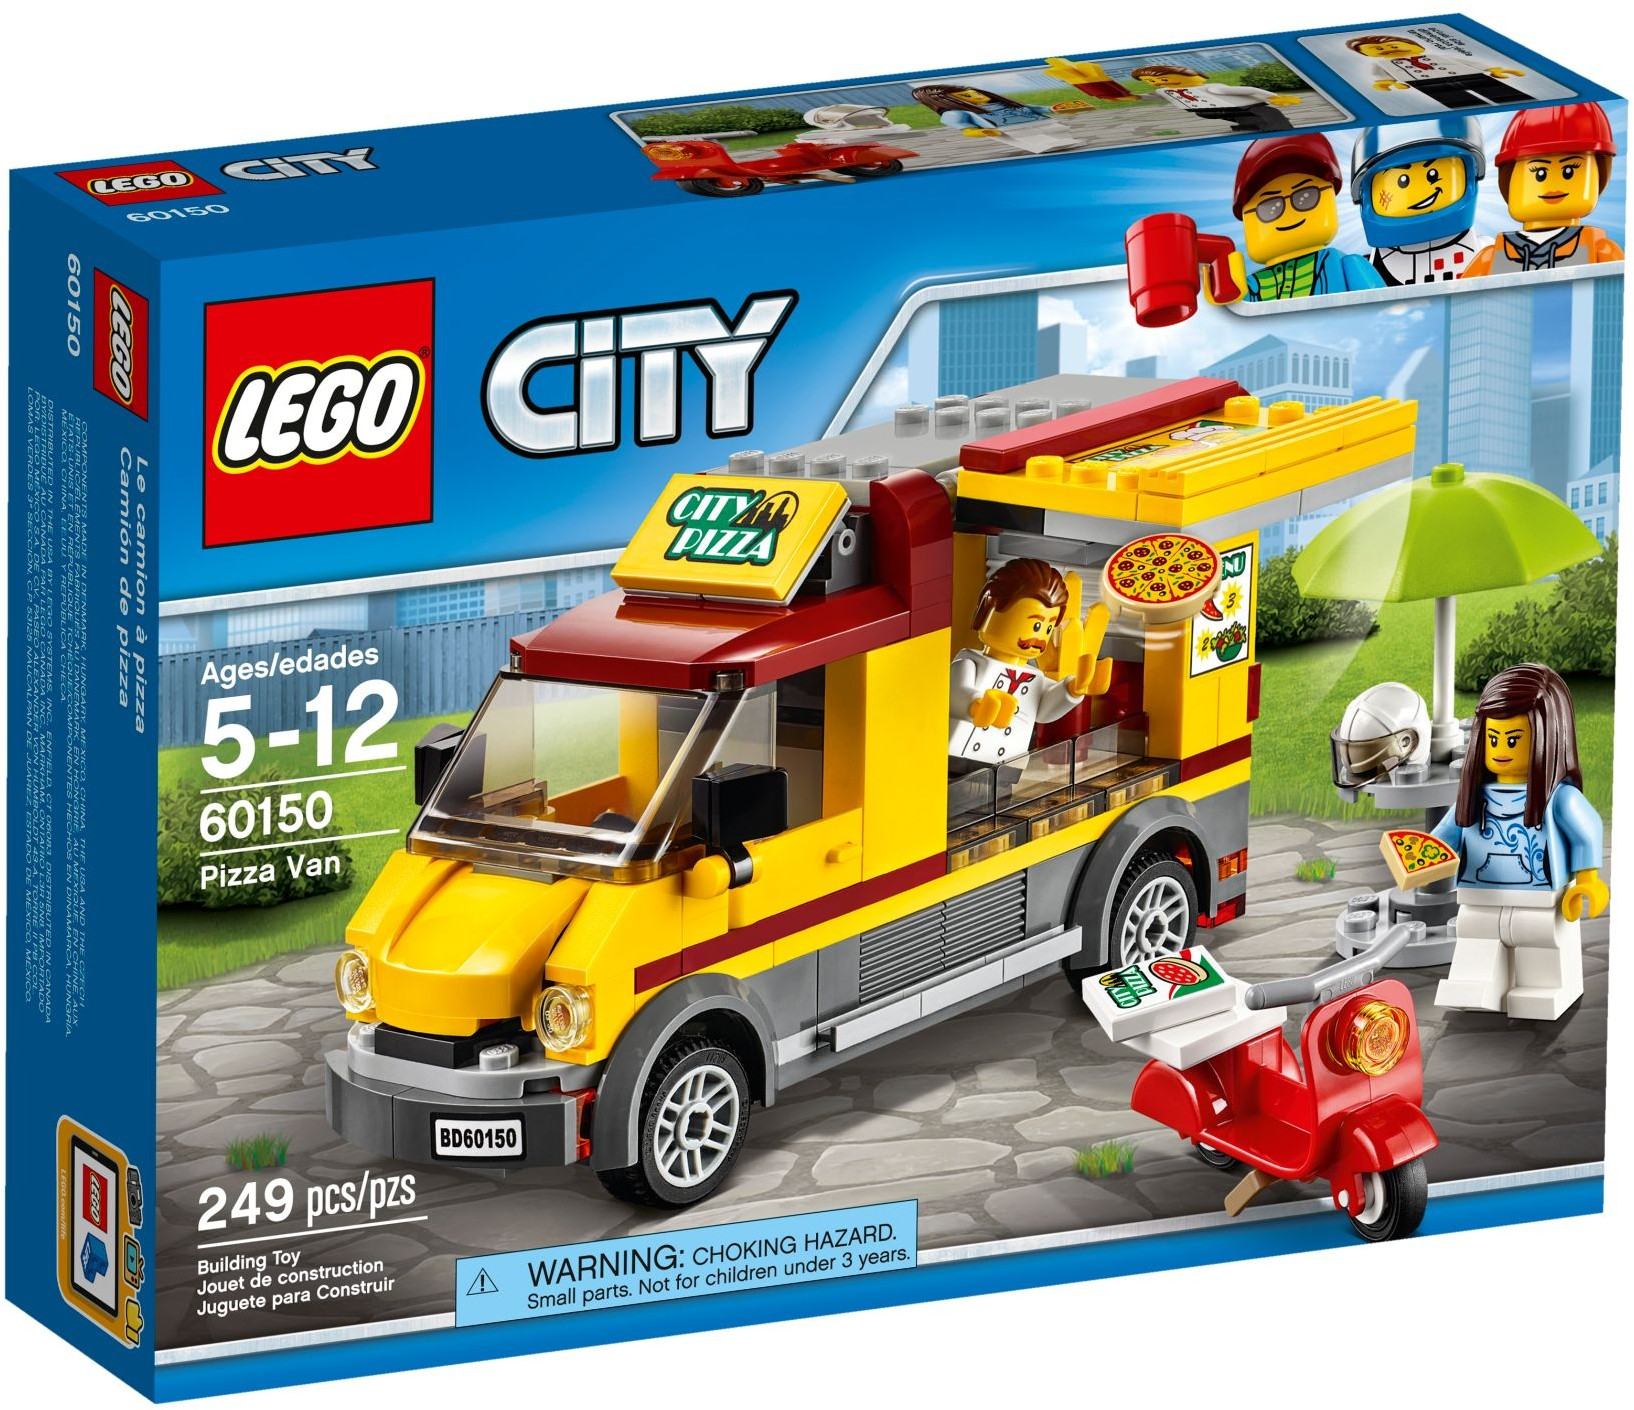 60150 LEGO City Great Vehicles Pizza Van